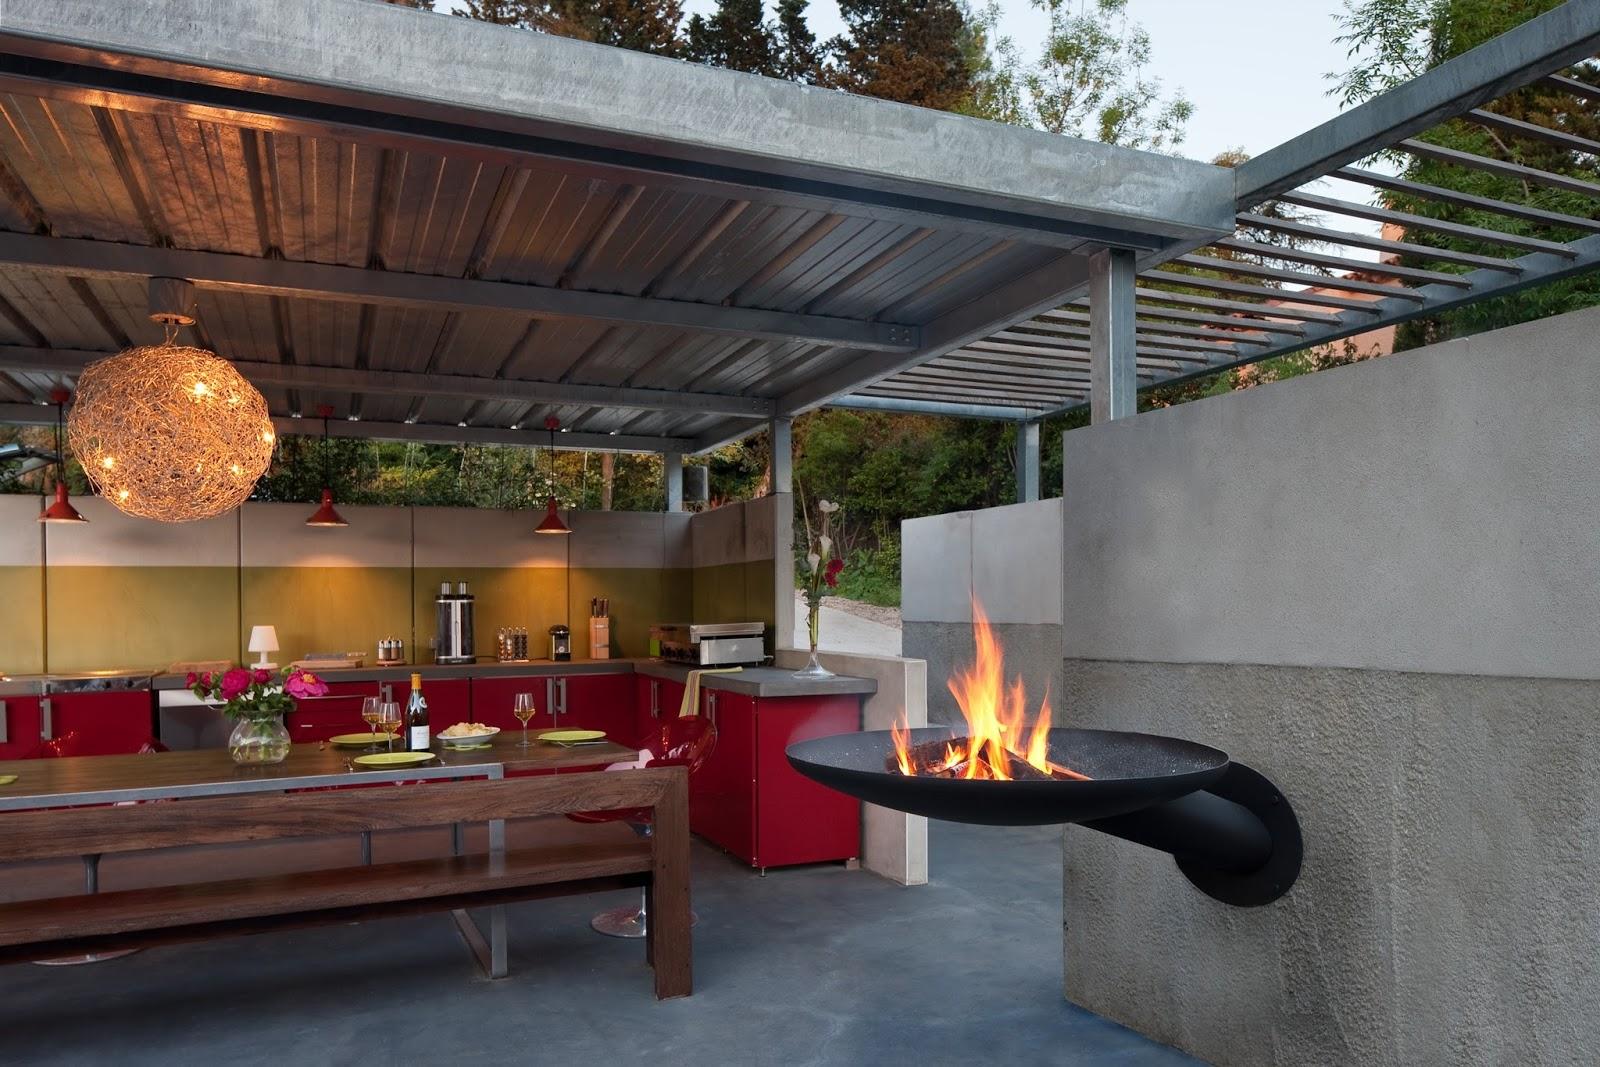 cuisine d ete barbecue. Black Bedroom Furniture Sets. Home Design Ideas